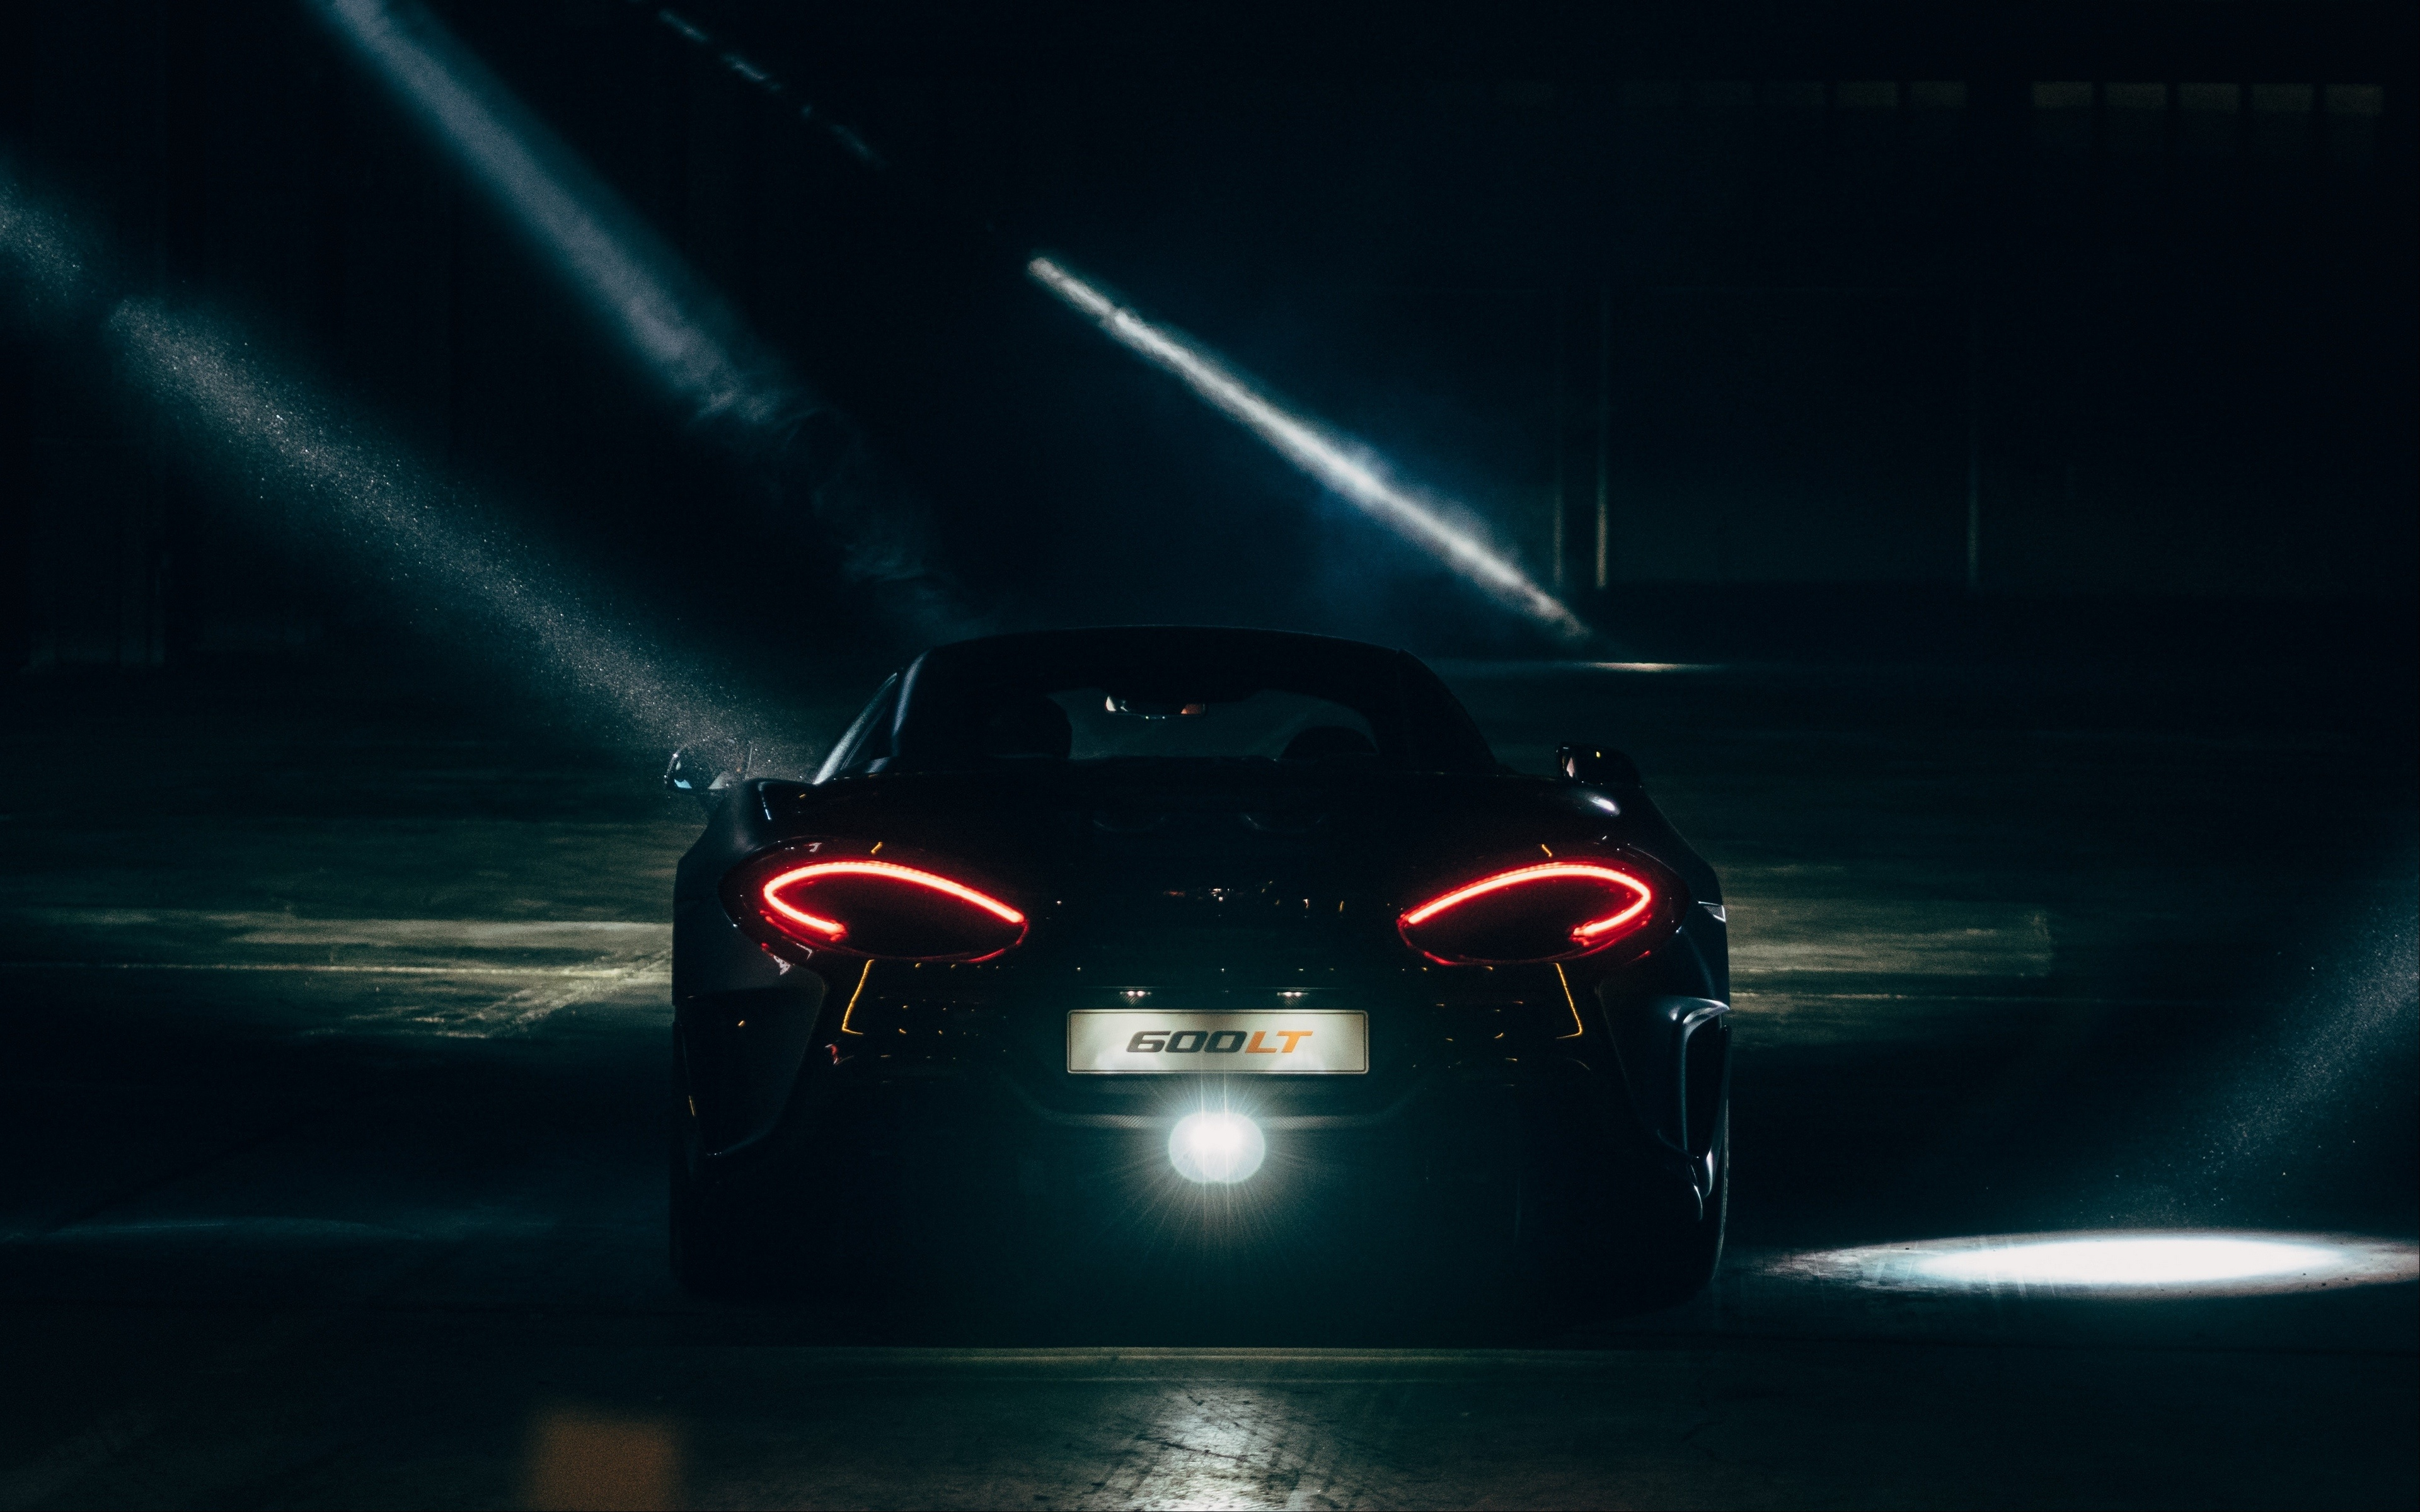 Download 3840x2400 Wallpaper Black Supercar Tail Lights Mclaren 4k Ultra Hd 16 10 Widescreen 3840x2400 Hd Image Background 18147